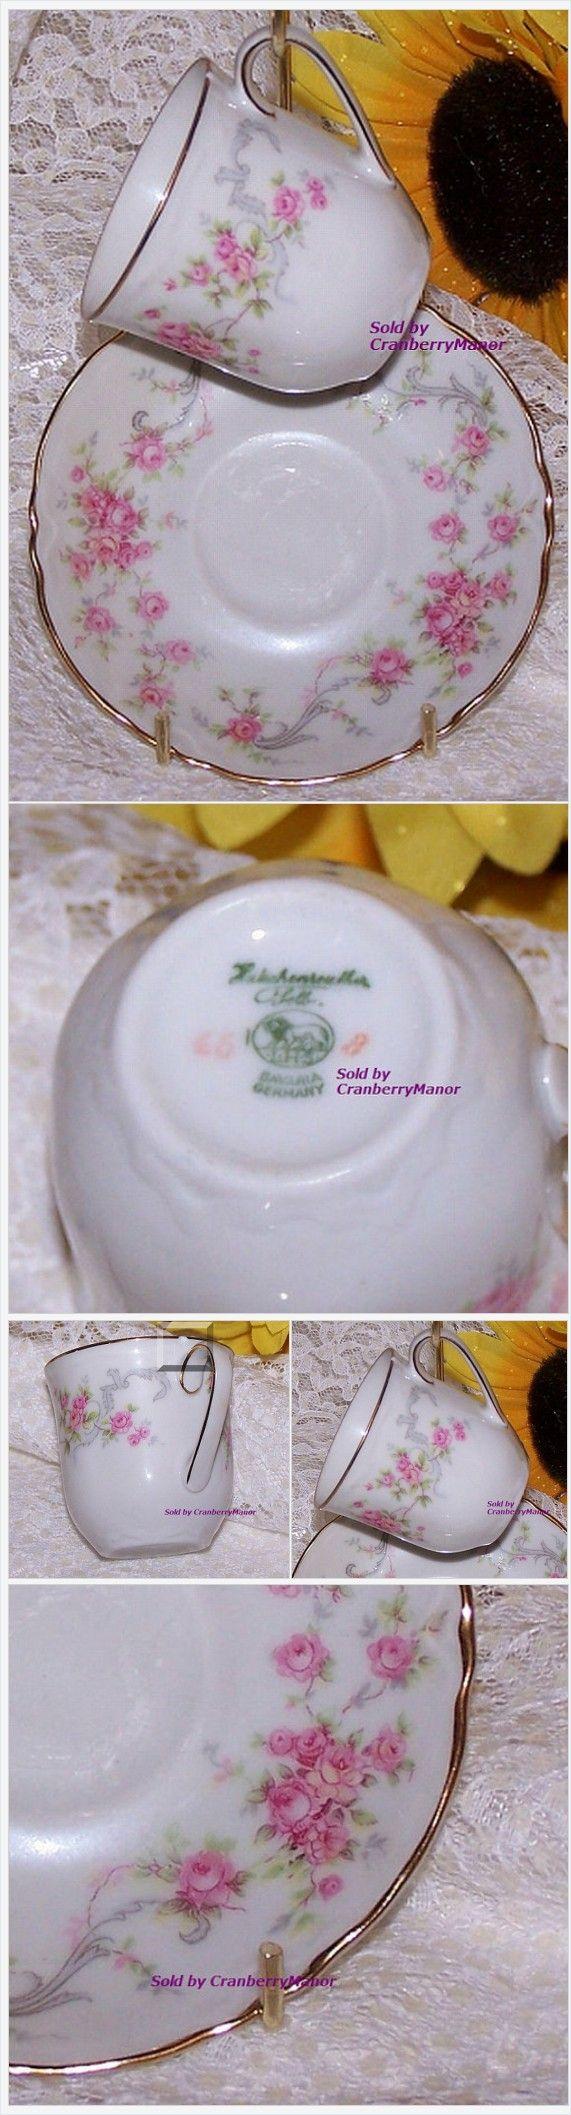 Pink Rose Tea Cup & Saucer by Lorenz #Hutschenreuther Selb Bavaria #Germany Richelieu #Demitasse #Vintage Mid Century 1960s #German #Designer #Gift ... #TeaCup #MidCentury http://cranberry-manor.com/pink-rose-tea-cup-saucer-lorenz-hutschenreuther-selb-bavaria-germany-richelieu-demitasse-vintage-mid-century-1960s-german-designer-gift/